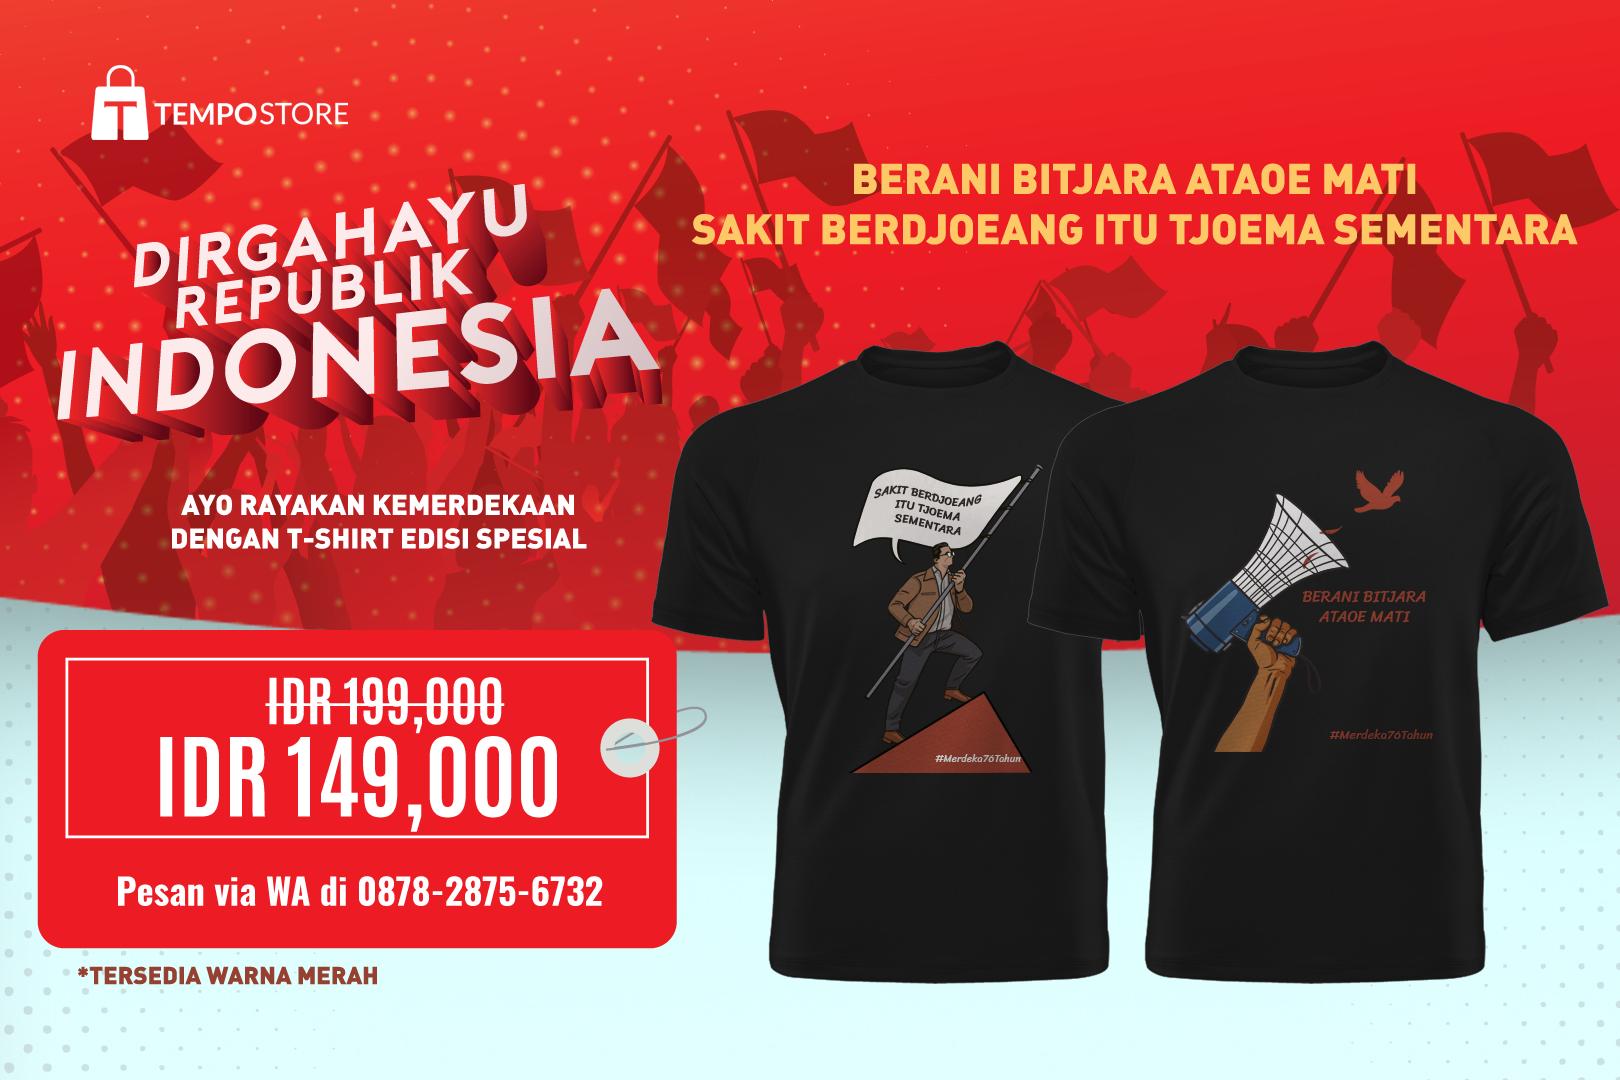 T-shirt Edisi Kemerdekaan (S, M, L, XL)